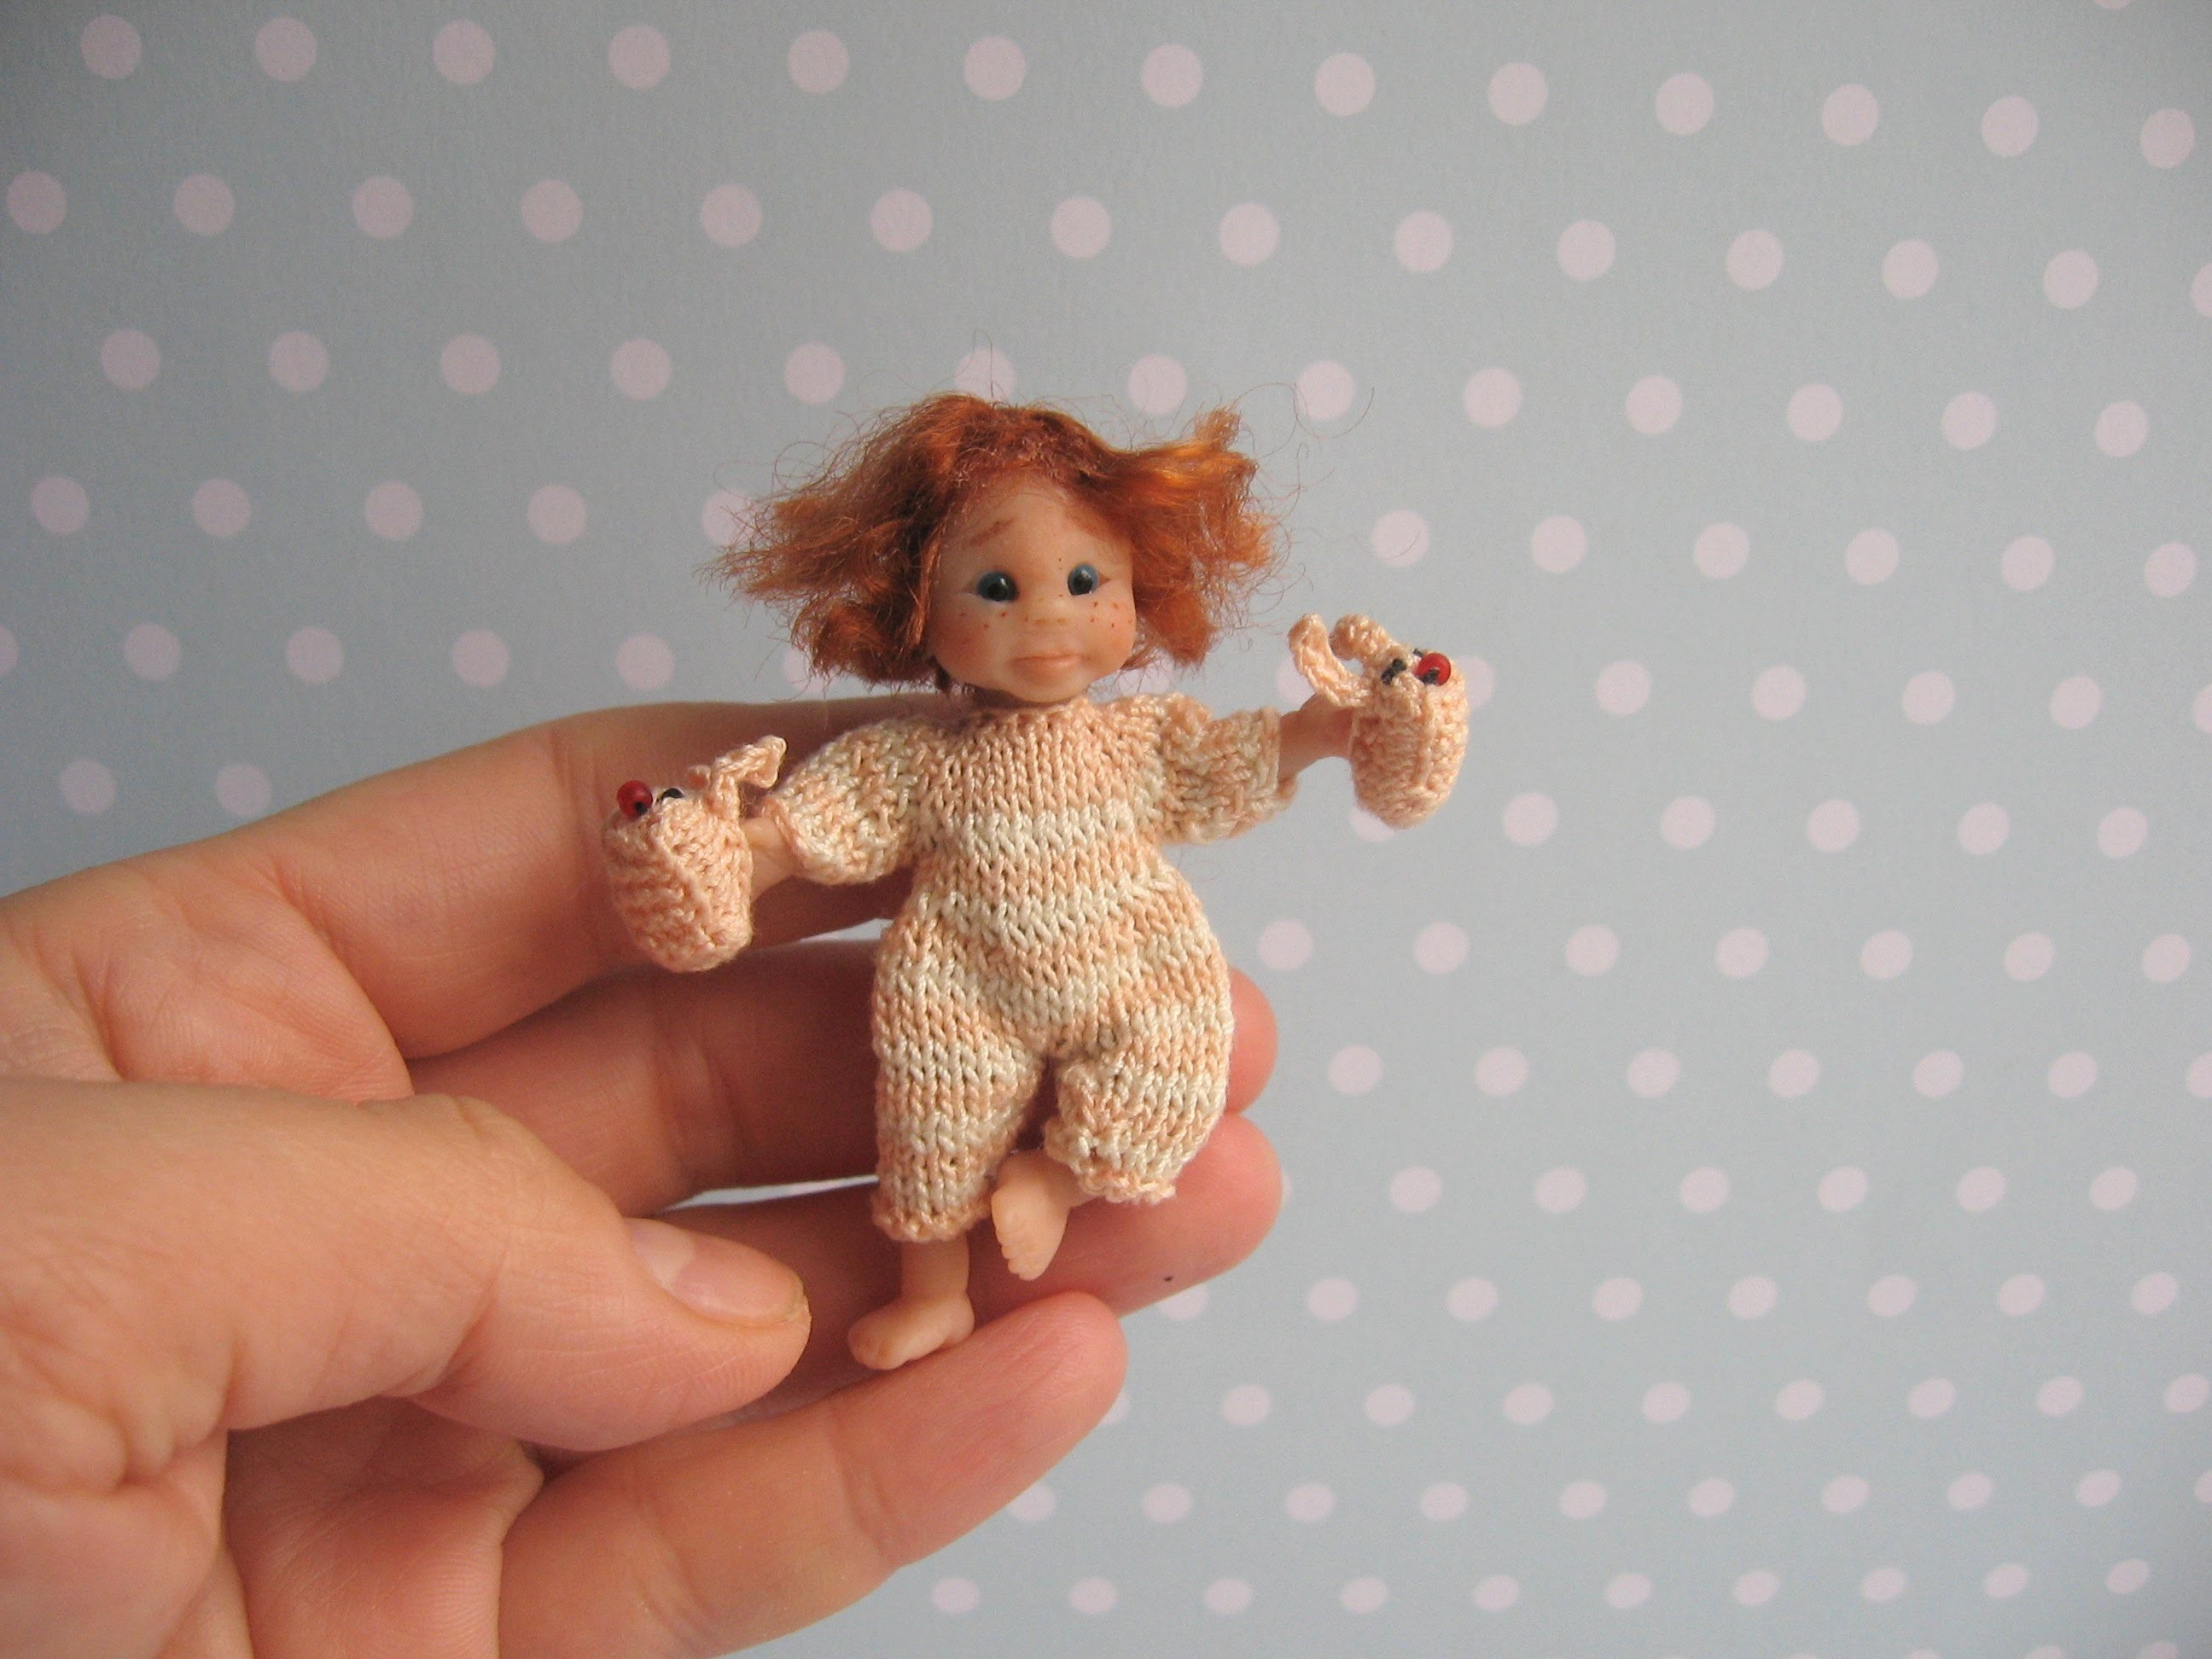 OOAK miniature Baby Girl 1:12 Beweglich Handgemacht - Dollhouse Polymer Clay doll Handmade